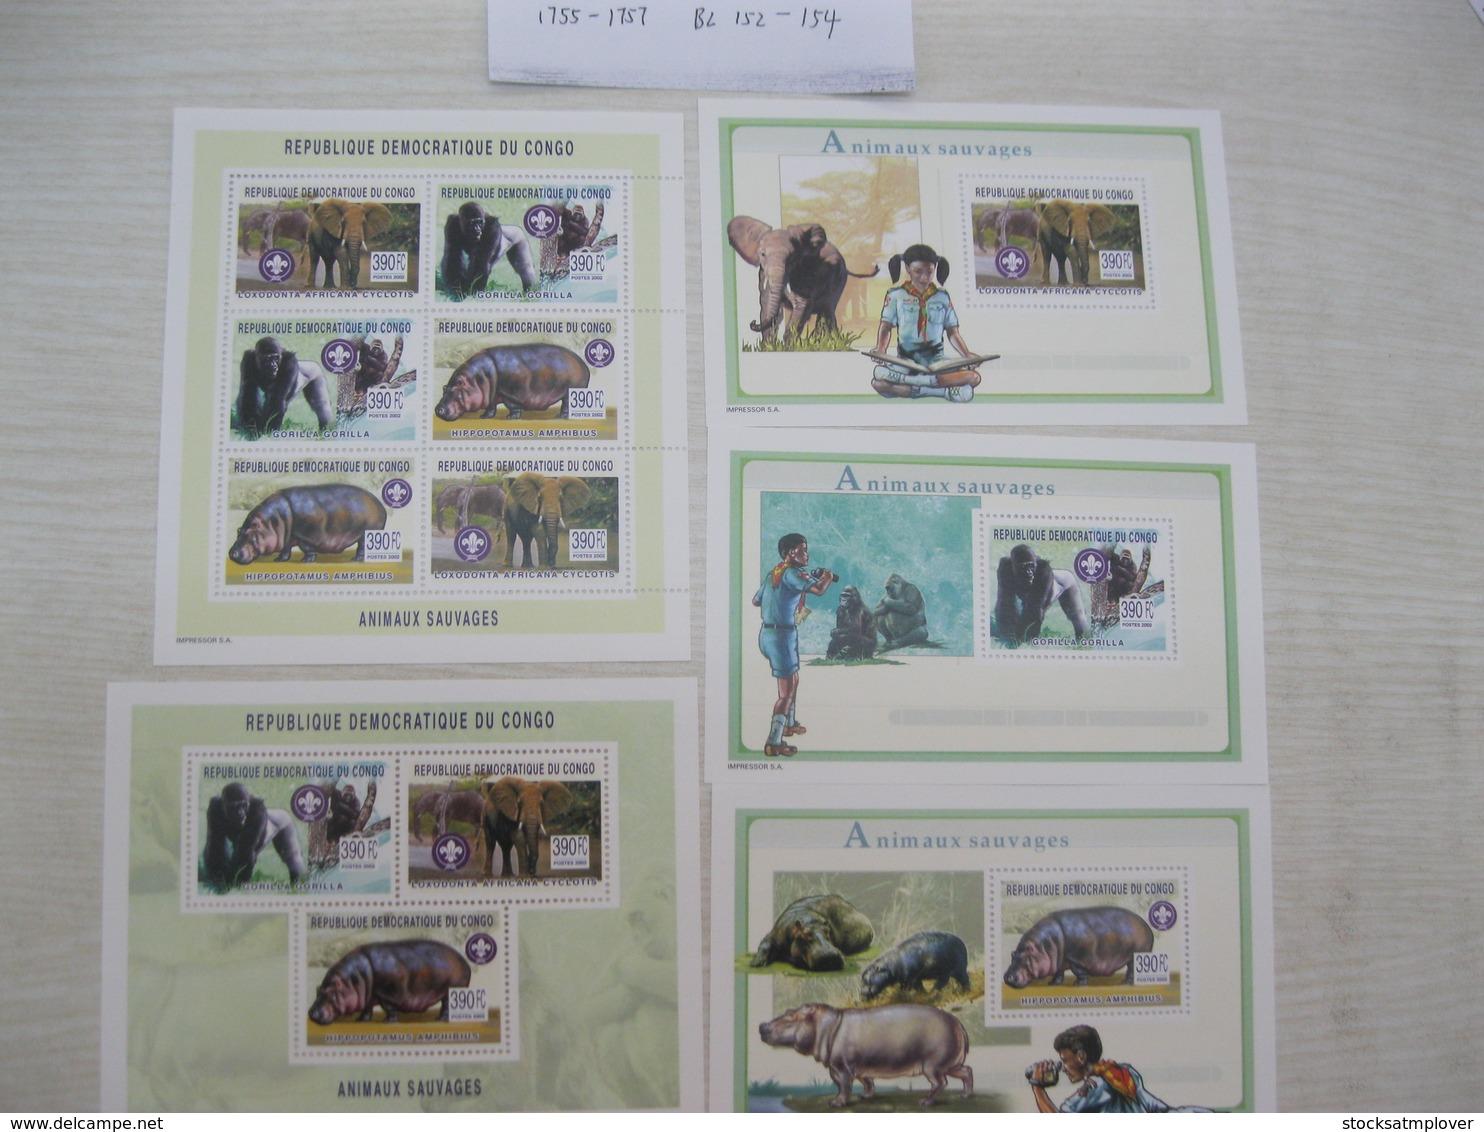 Congo (Kinshasa ) 2002  African Animals Hippos  Elephants  MI 1755-1757  BL152-154 - Democratic Republic Of Congo (1997 - ...)